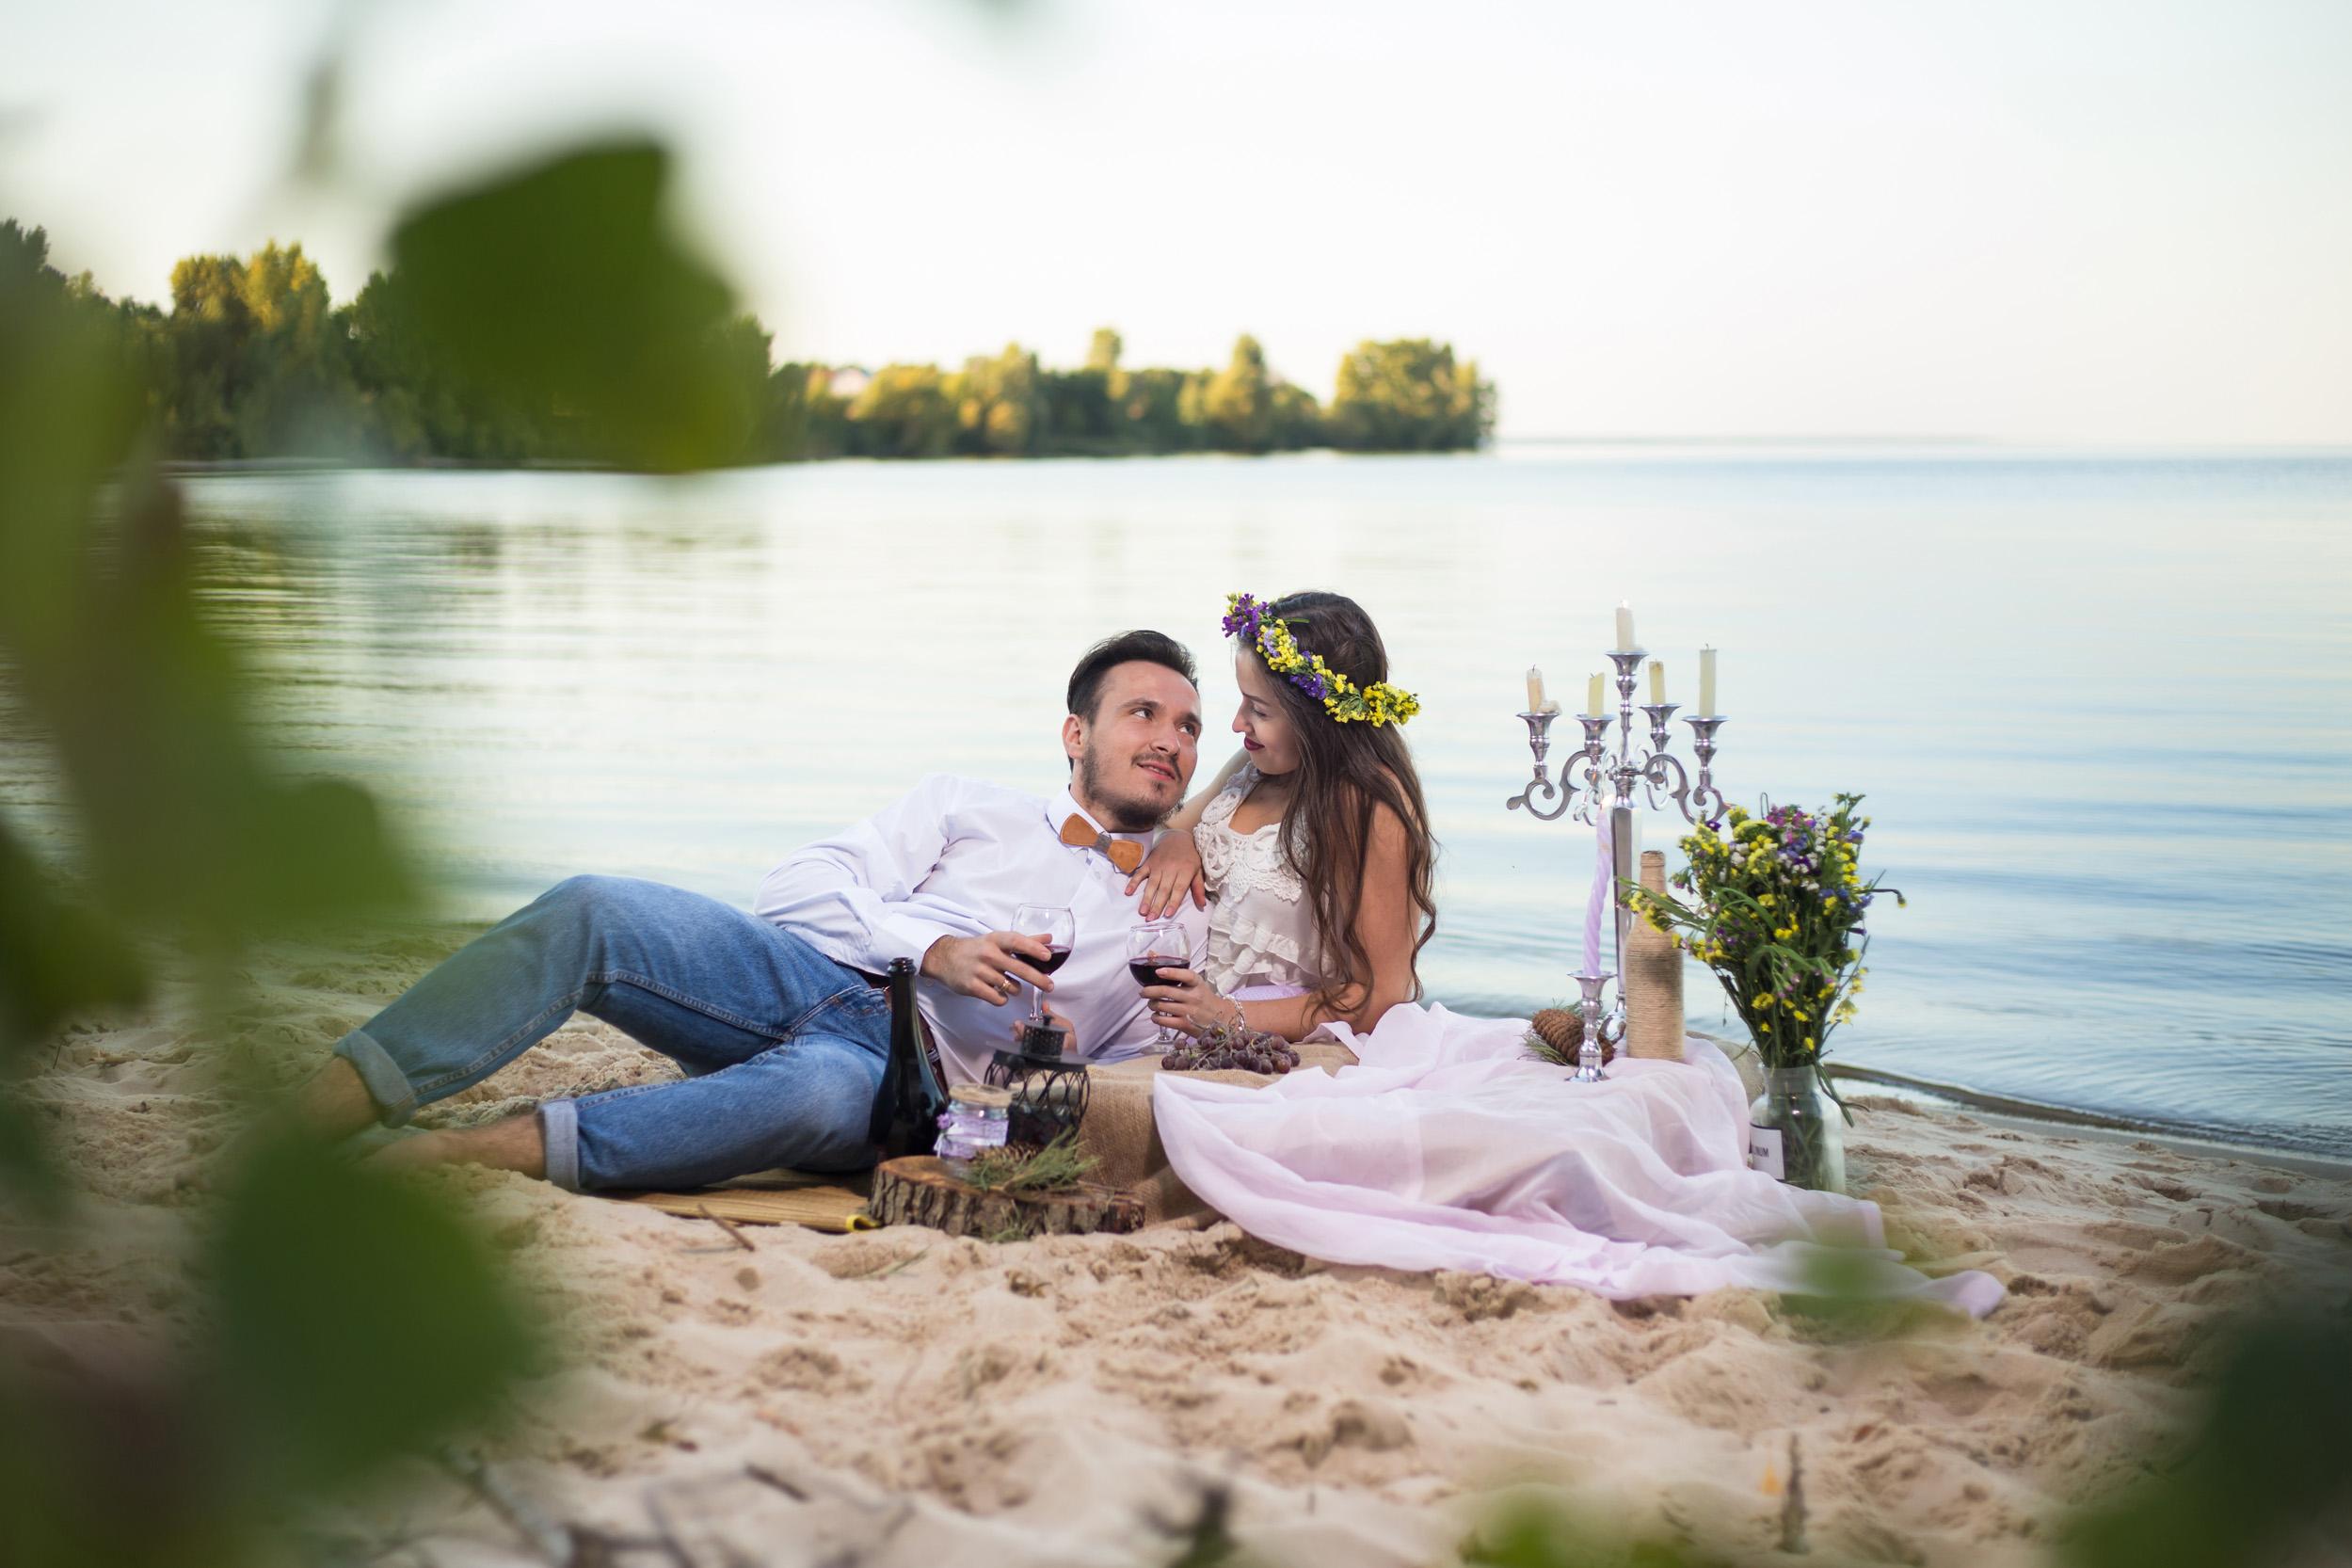 идея для фото пикник на берегу моря, Лавстори на берегу моря